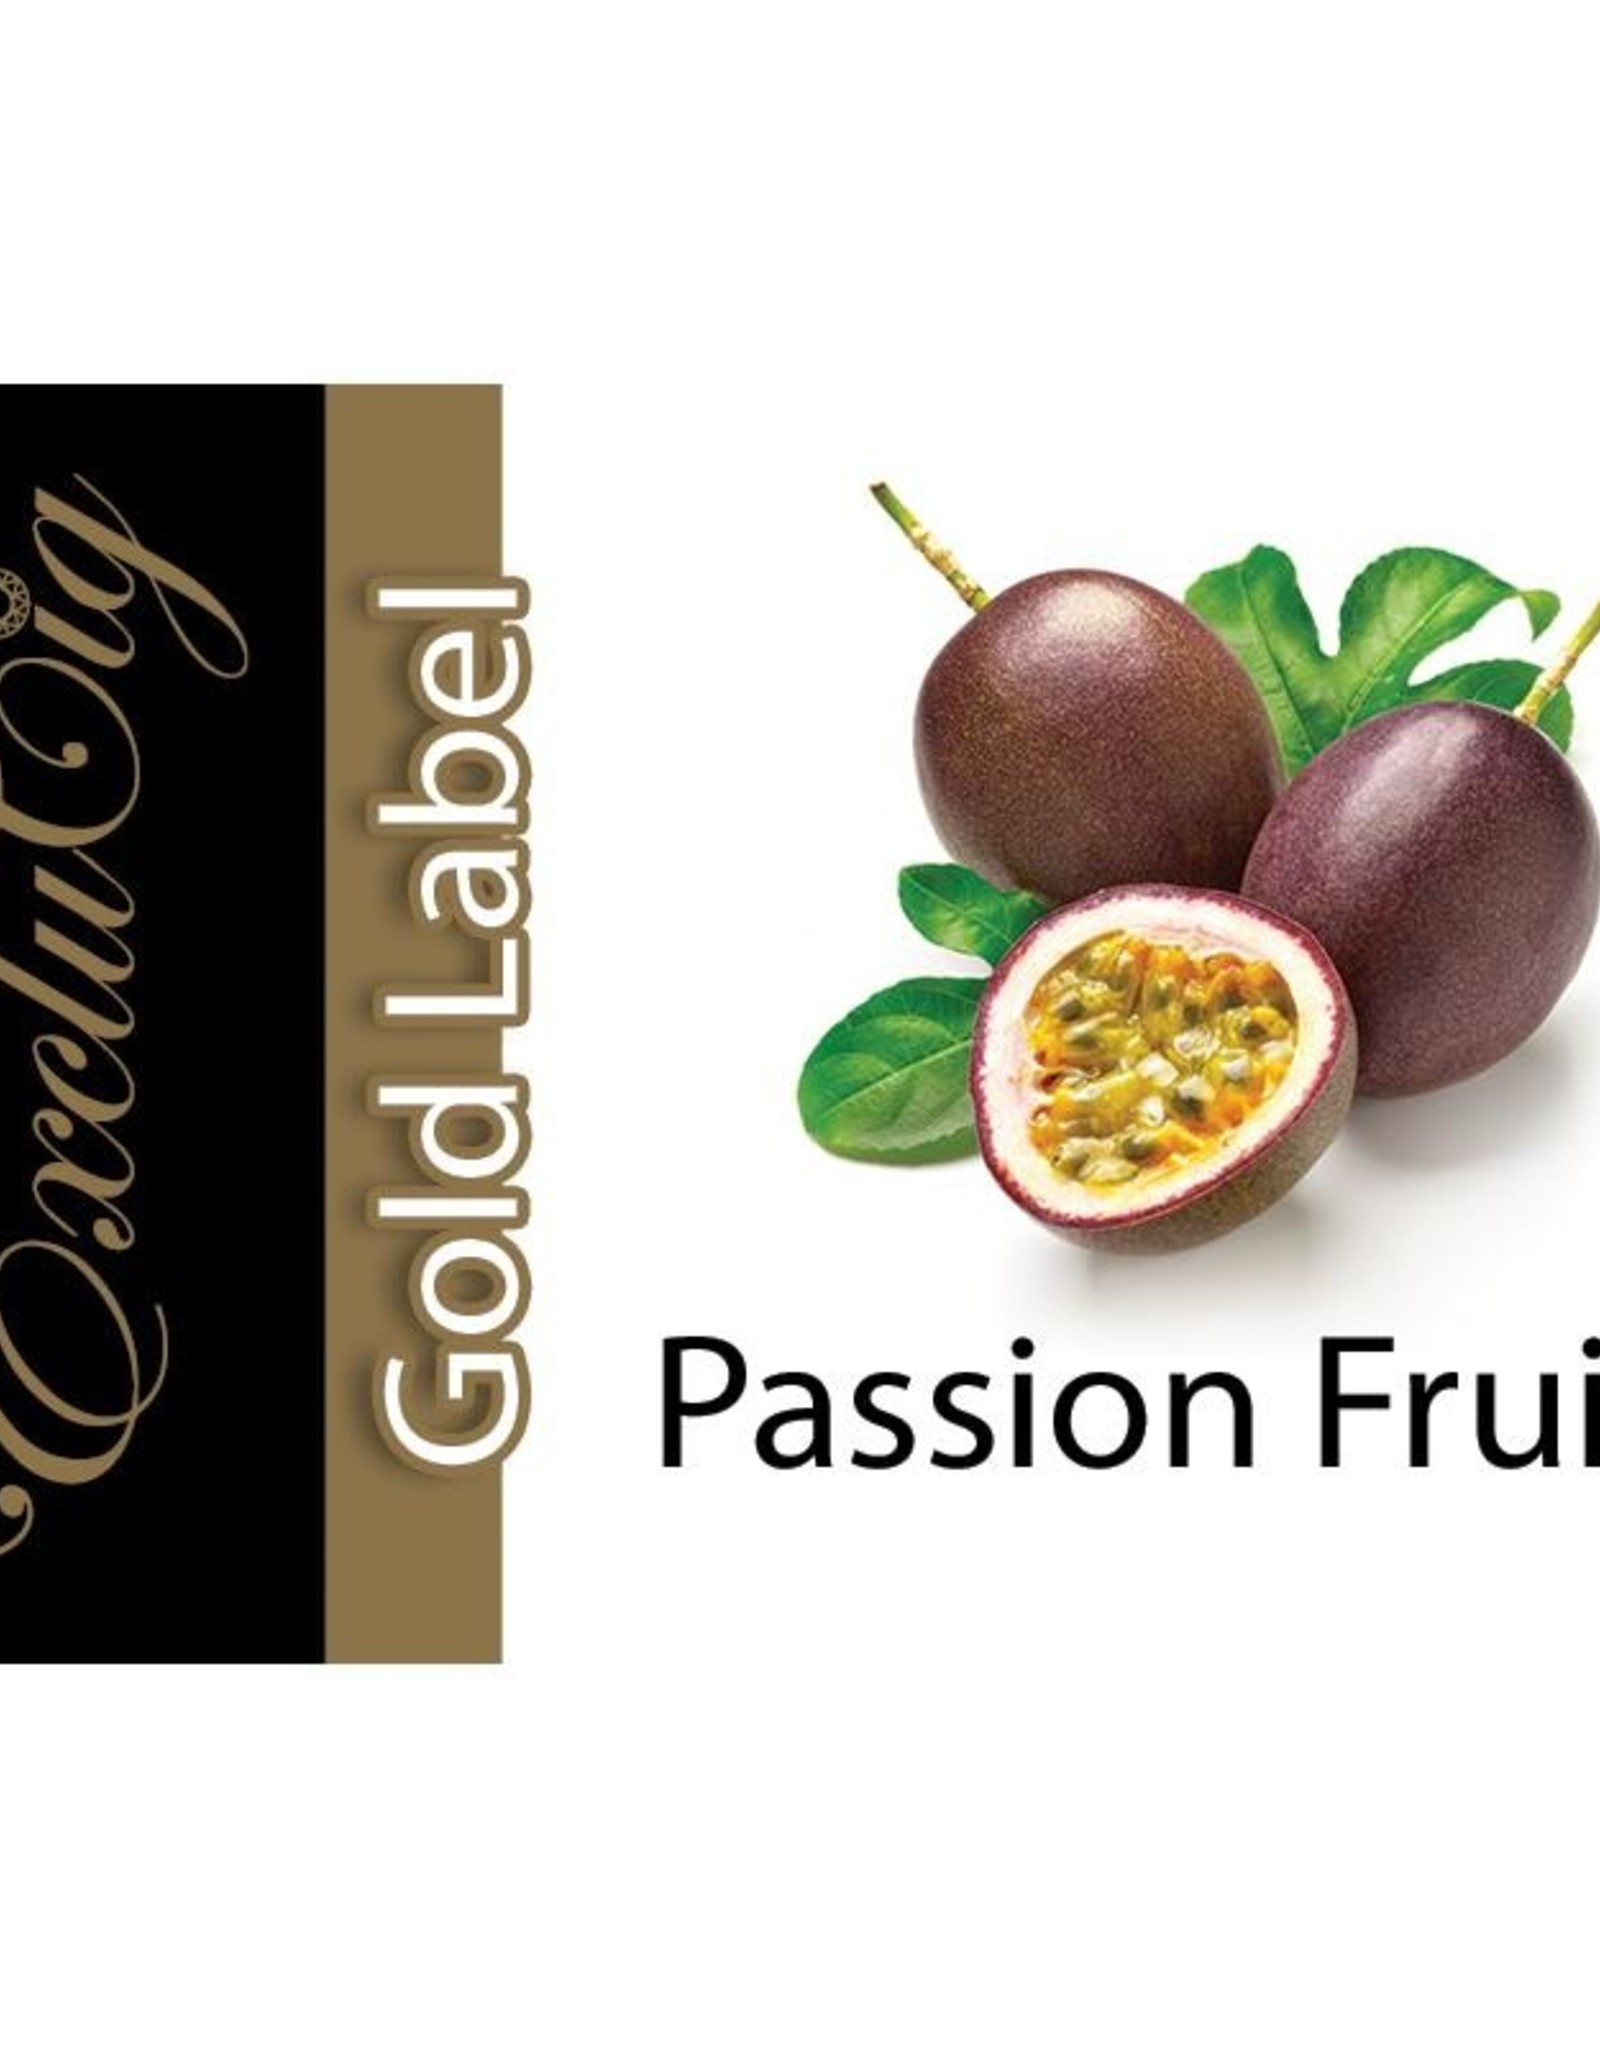 Exclucig Exclucig Gold Label E-liquid Passion Fruit 18 mg Nicotine